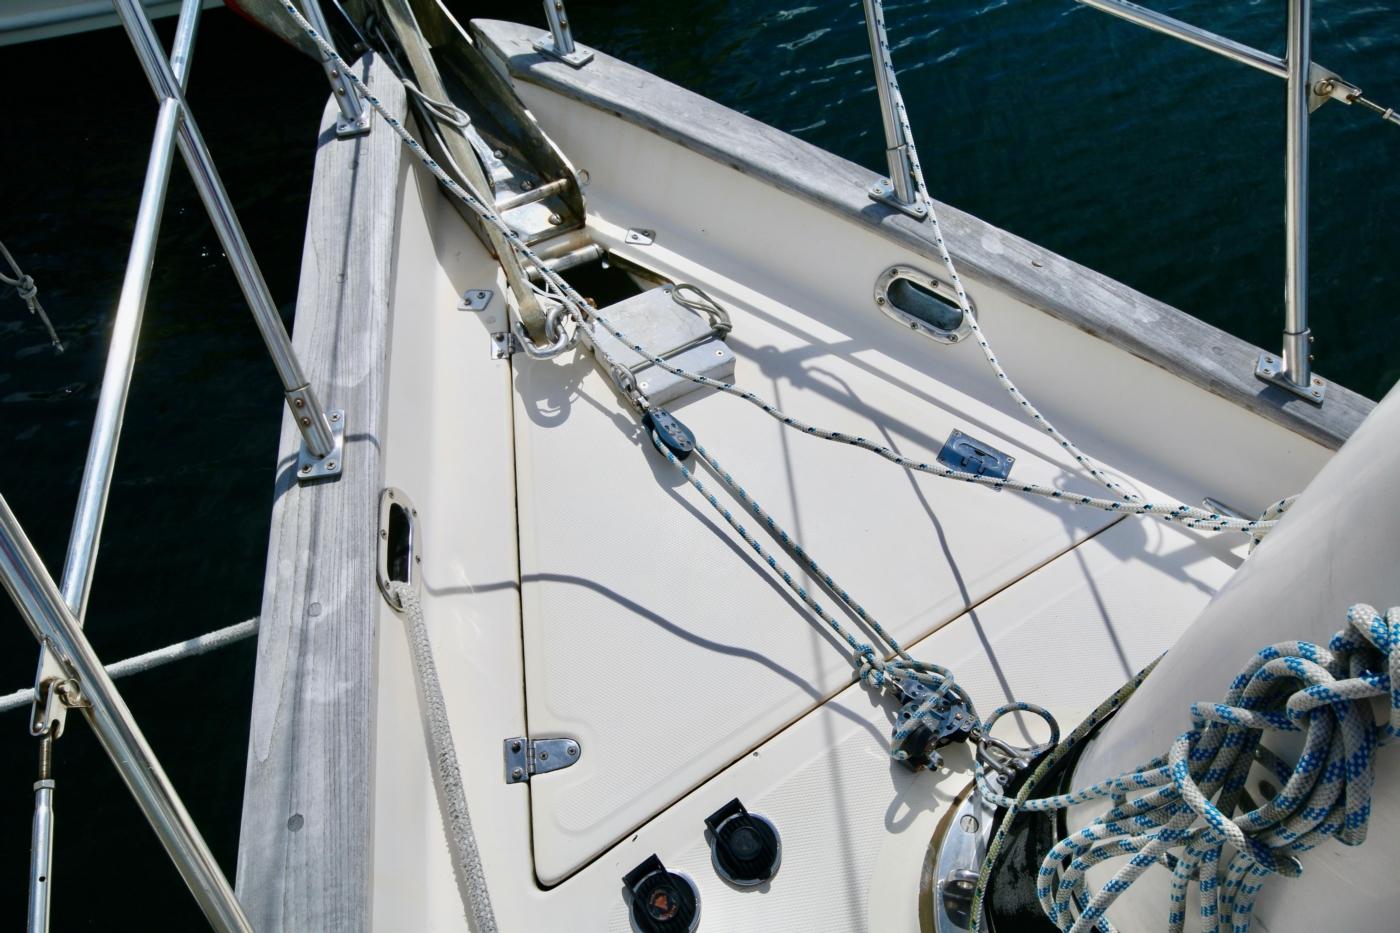 1996 Tanton 45 Offshore, Foredeck